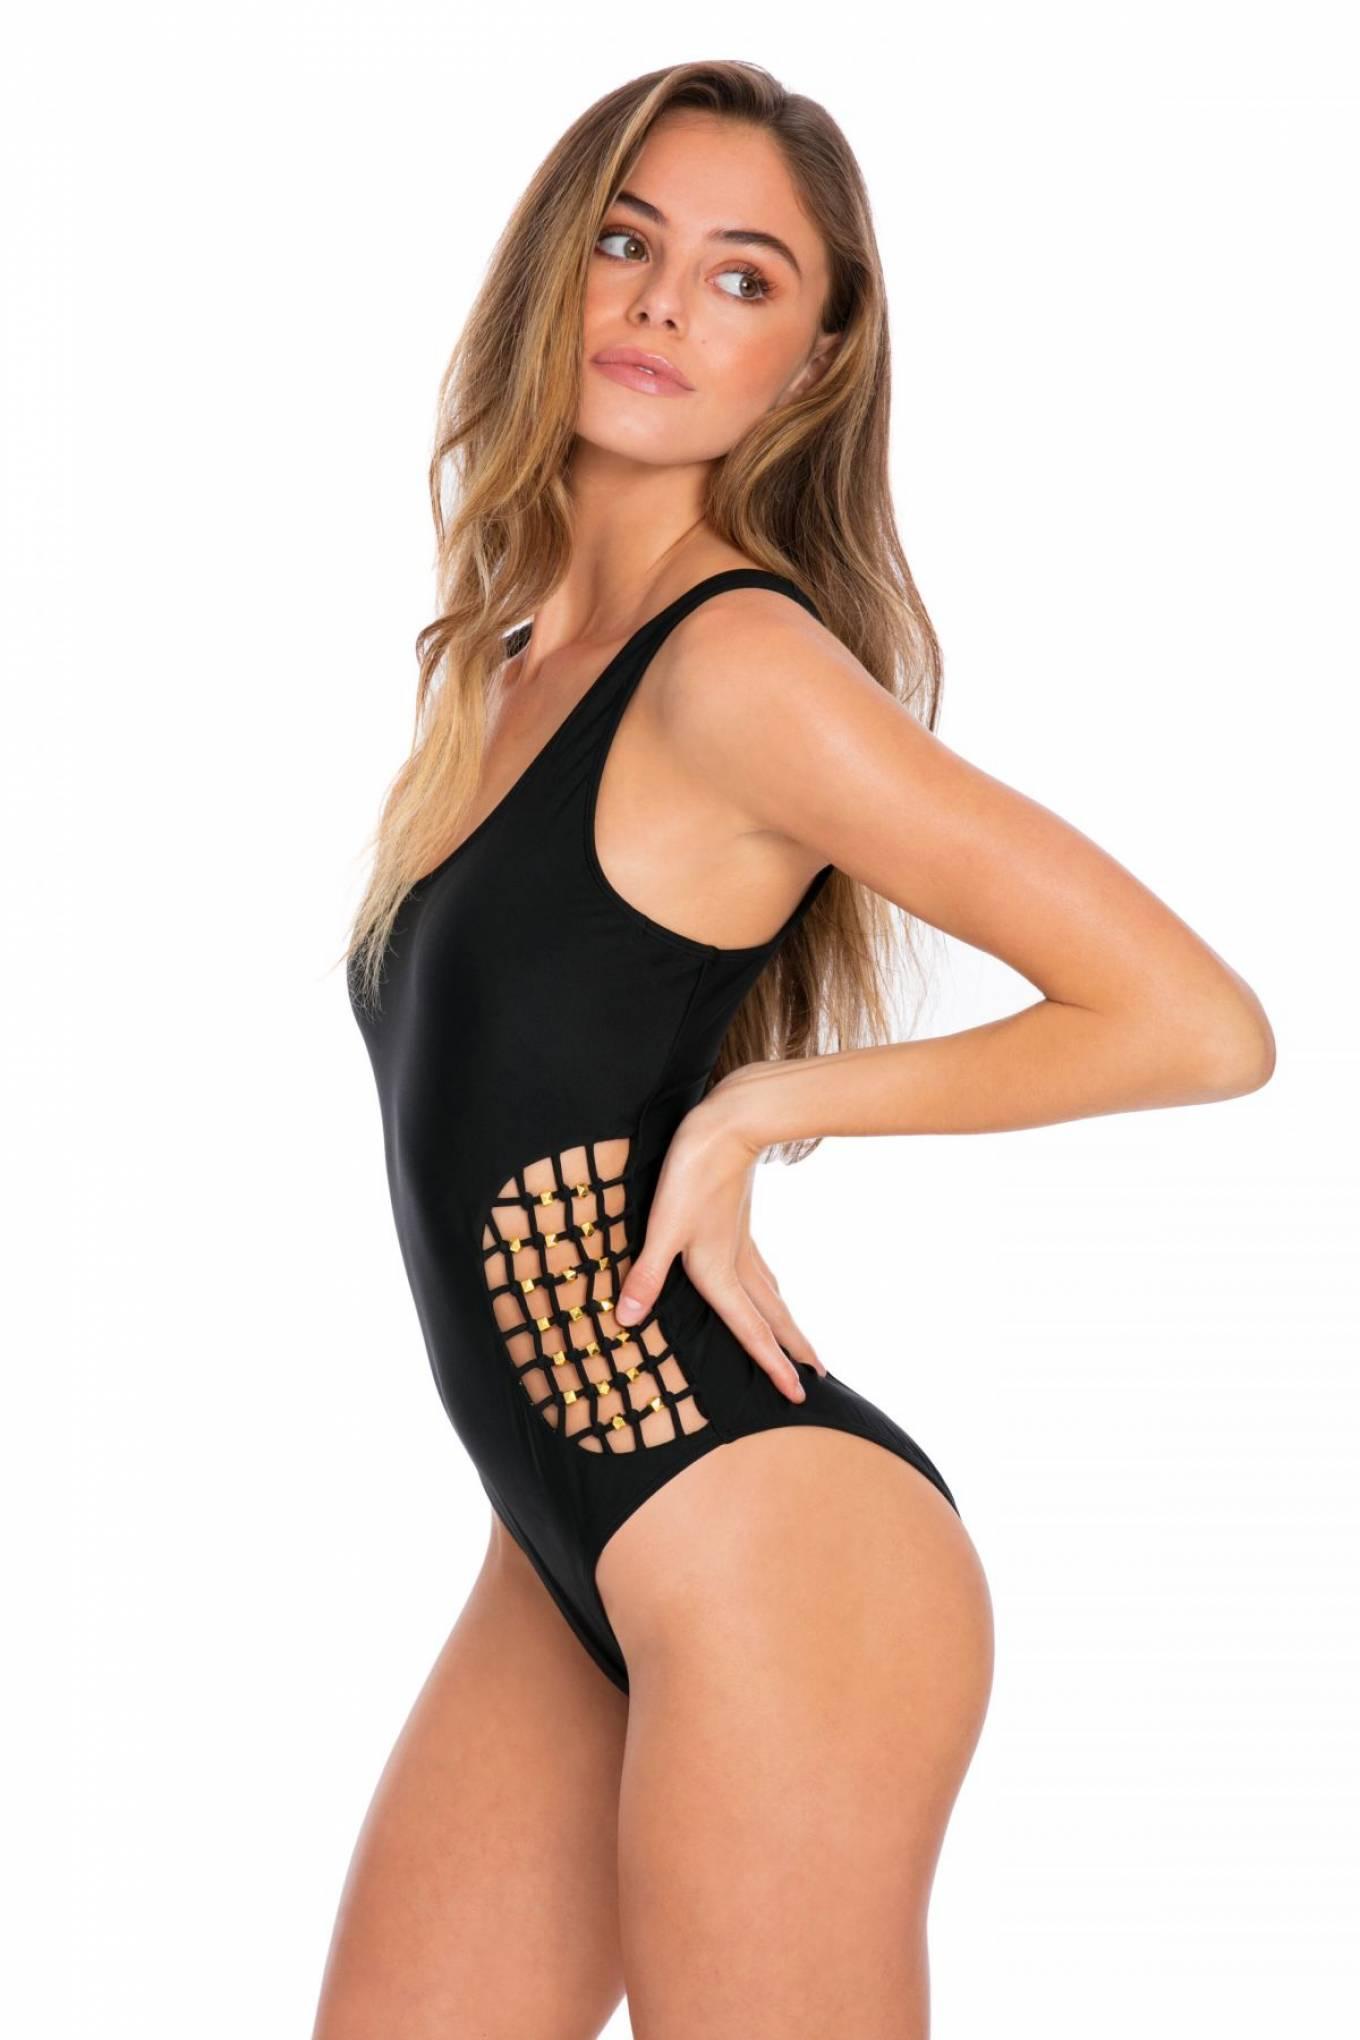 Daniella Beckerman 2020 : Daniella Beckerman – Cabana De Sol Swimwear collection 2020-29